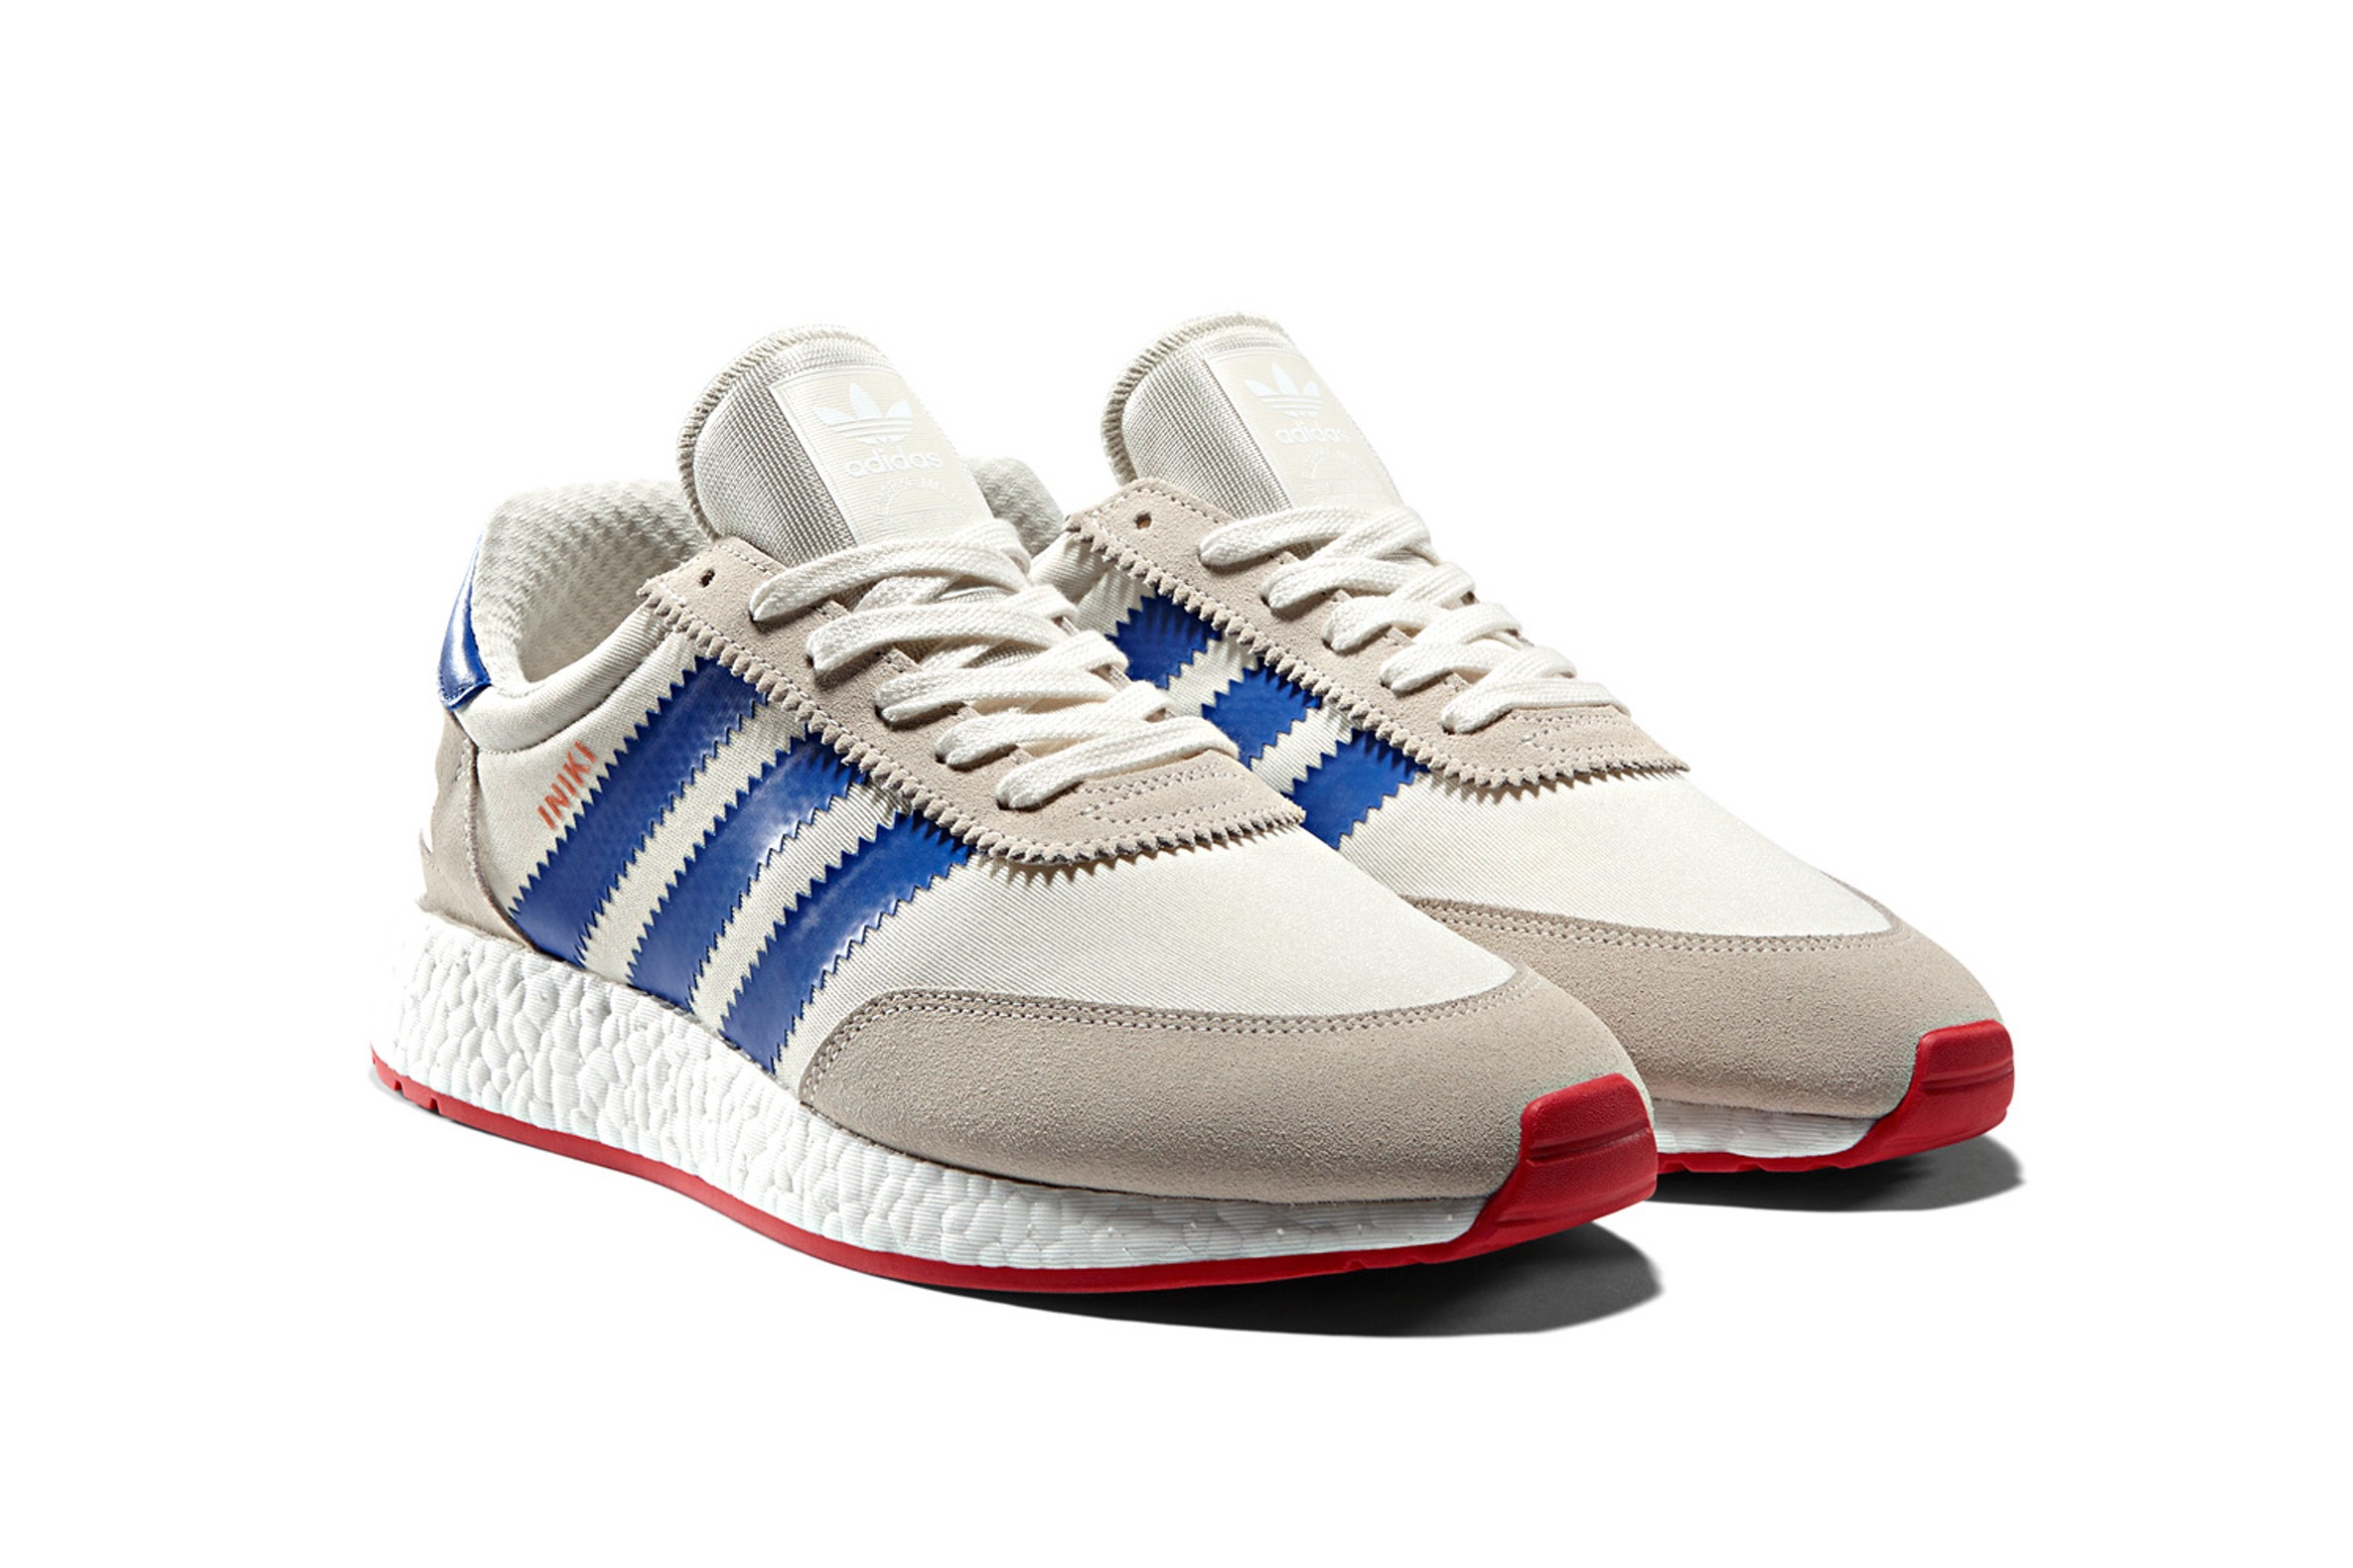 http---hypebeast.com-image-2017-04-adidas-originals-iniki-runner-pride-of-the-70s-2